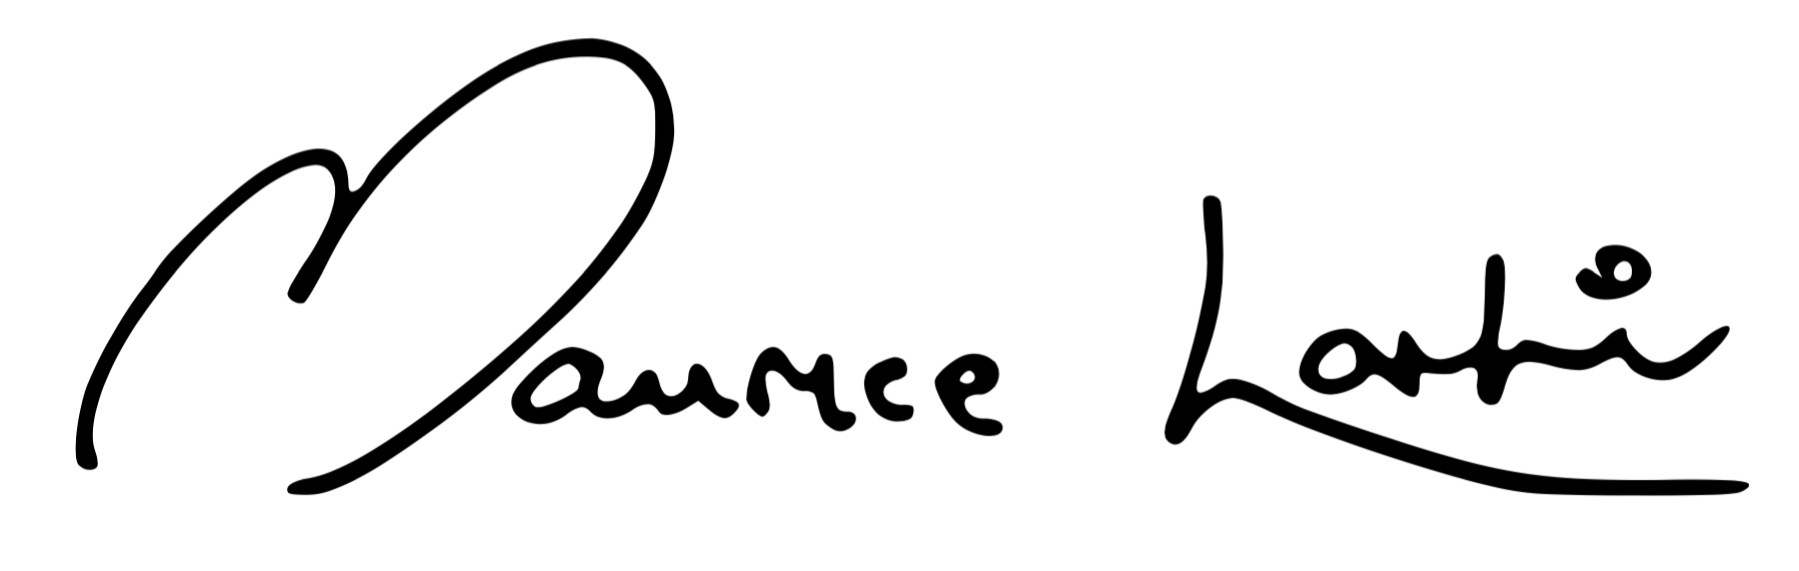 Maurice Larkin Signature